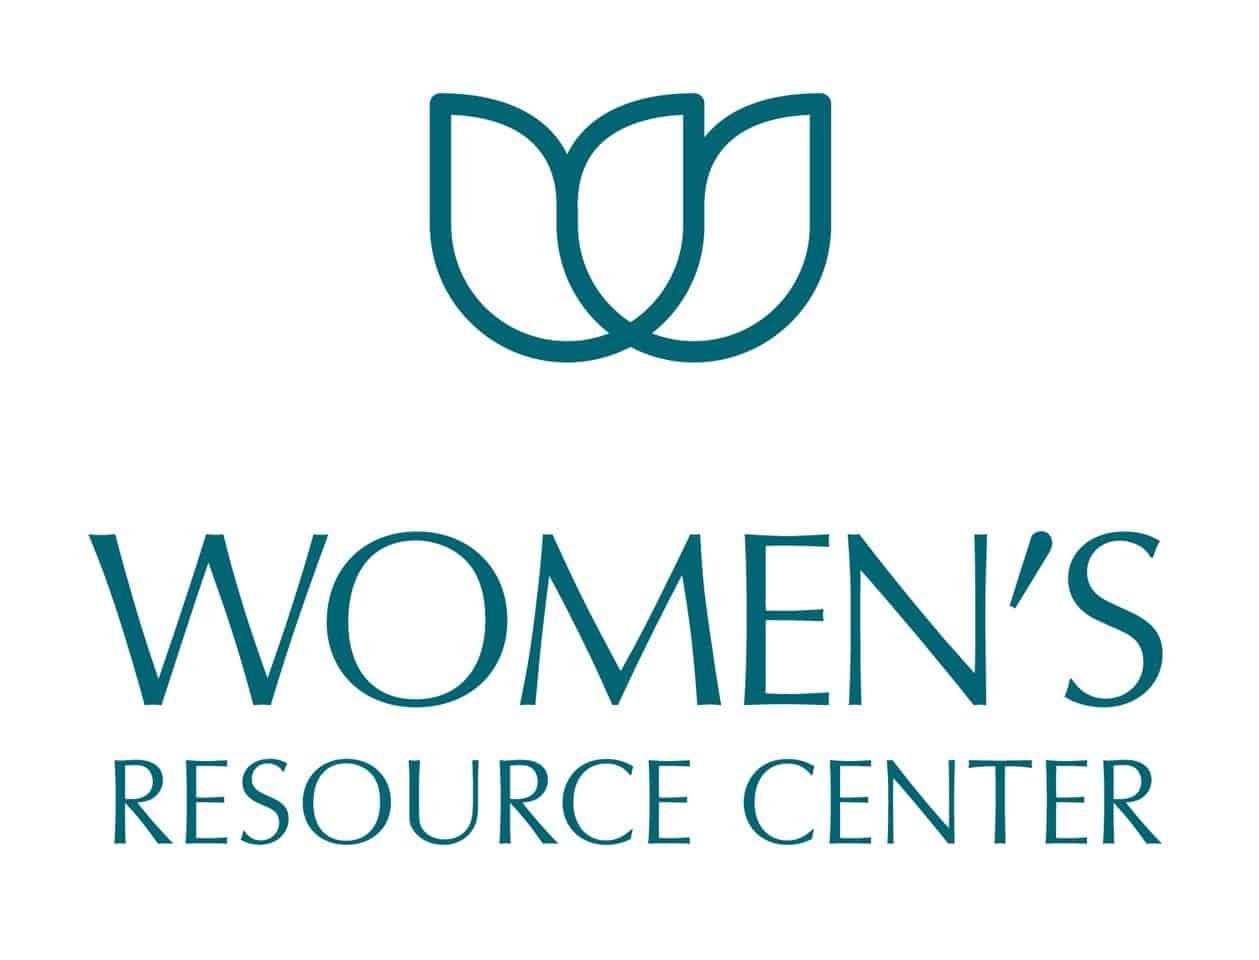 Womens-Resource-Center-Logo.jpg